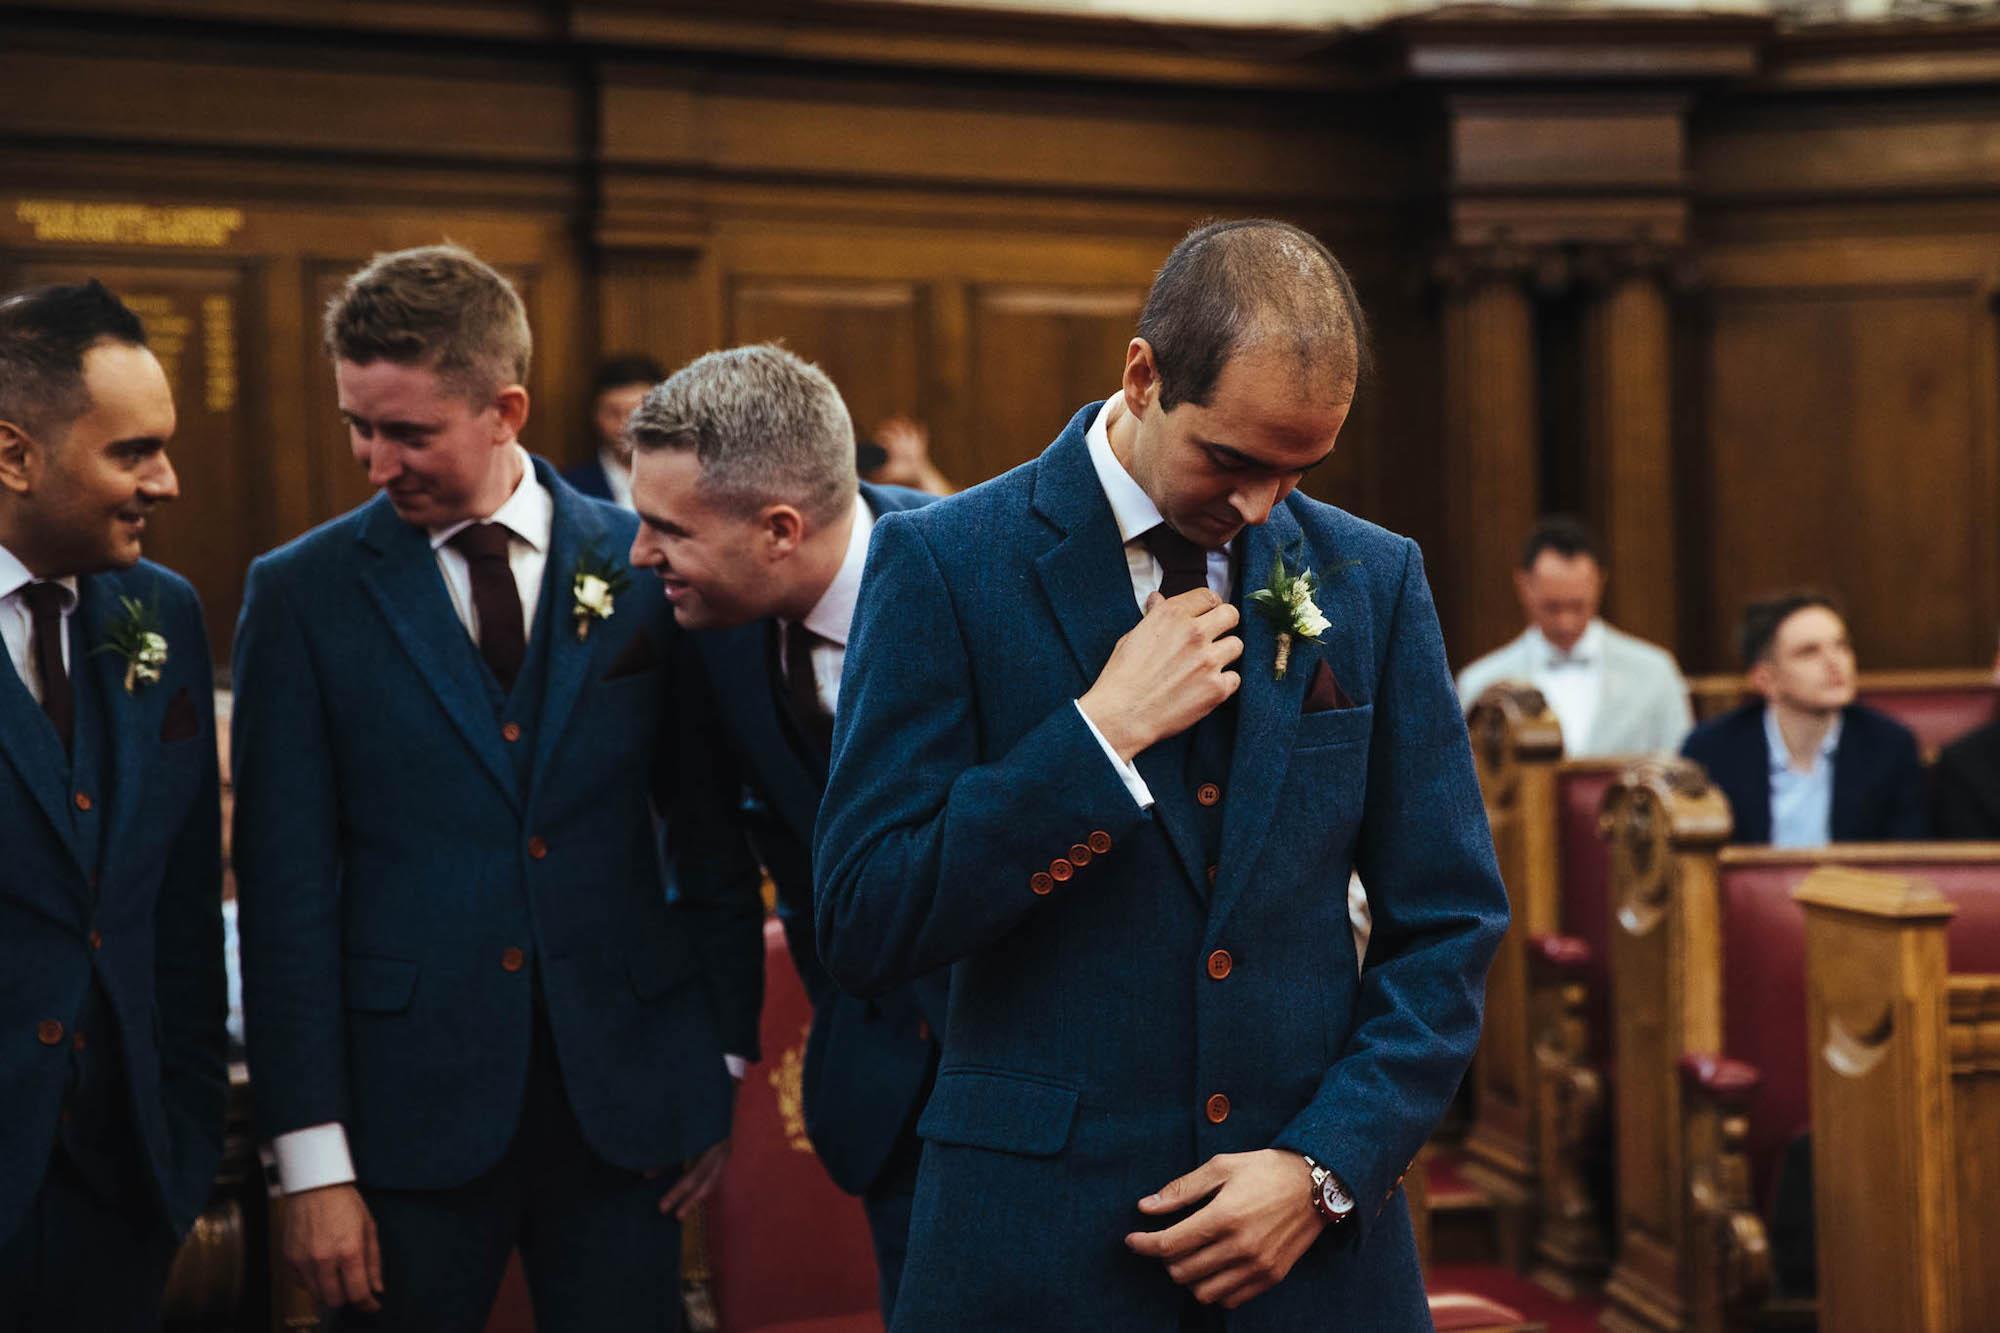 Islington town hall wedding